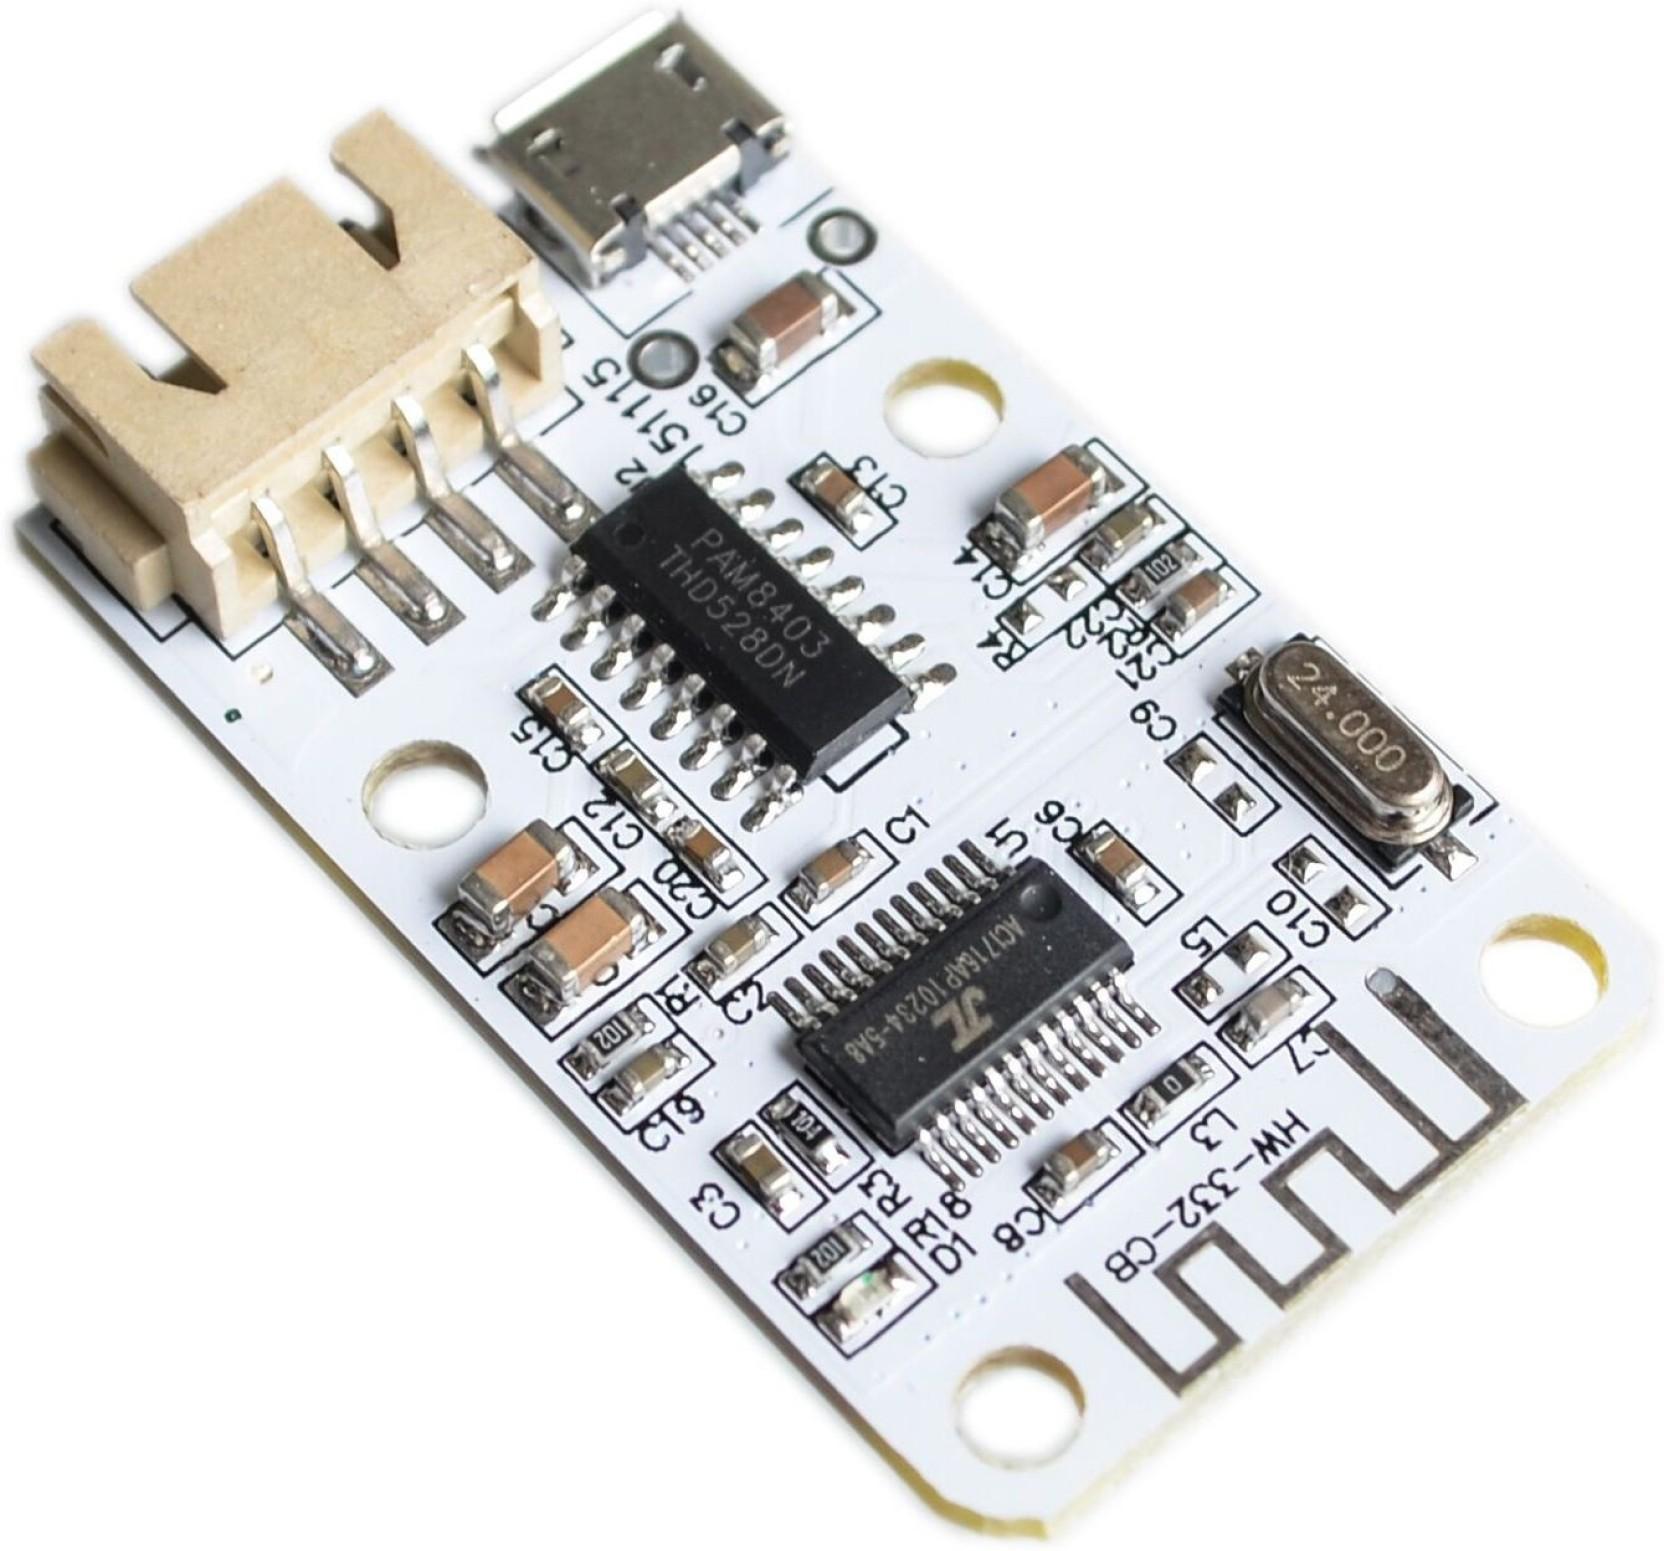 Sunrobotics Dc 5v Bluetooth Power Amplifier Board Micro Usb Digital Circuit Wall Murals Share